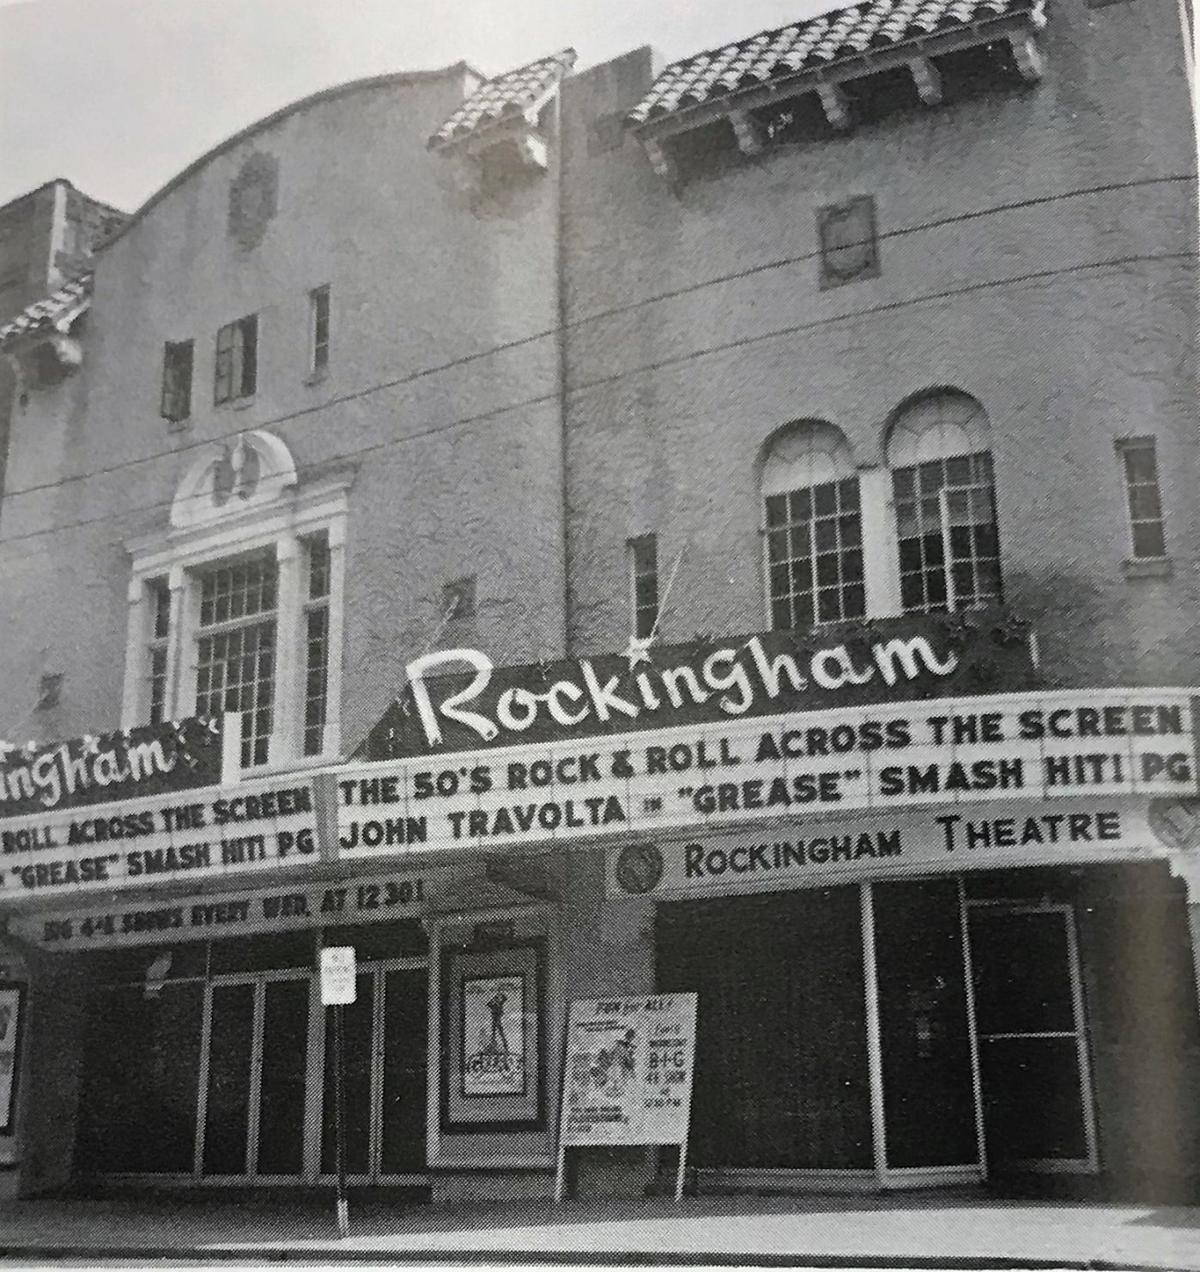 The Rockingham Theatre